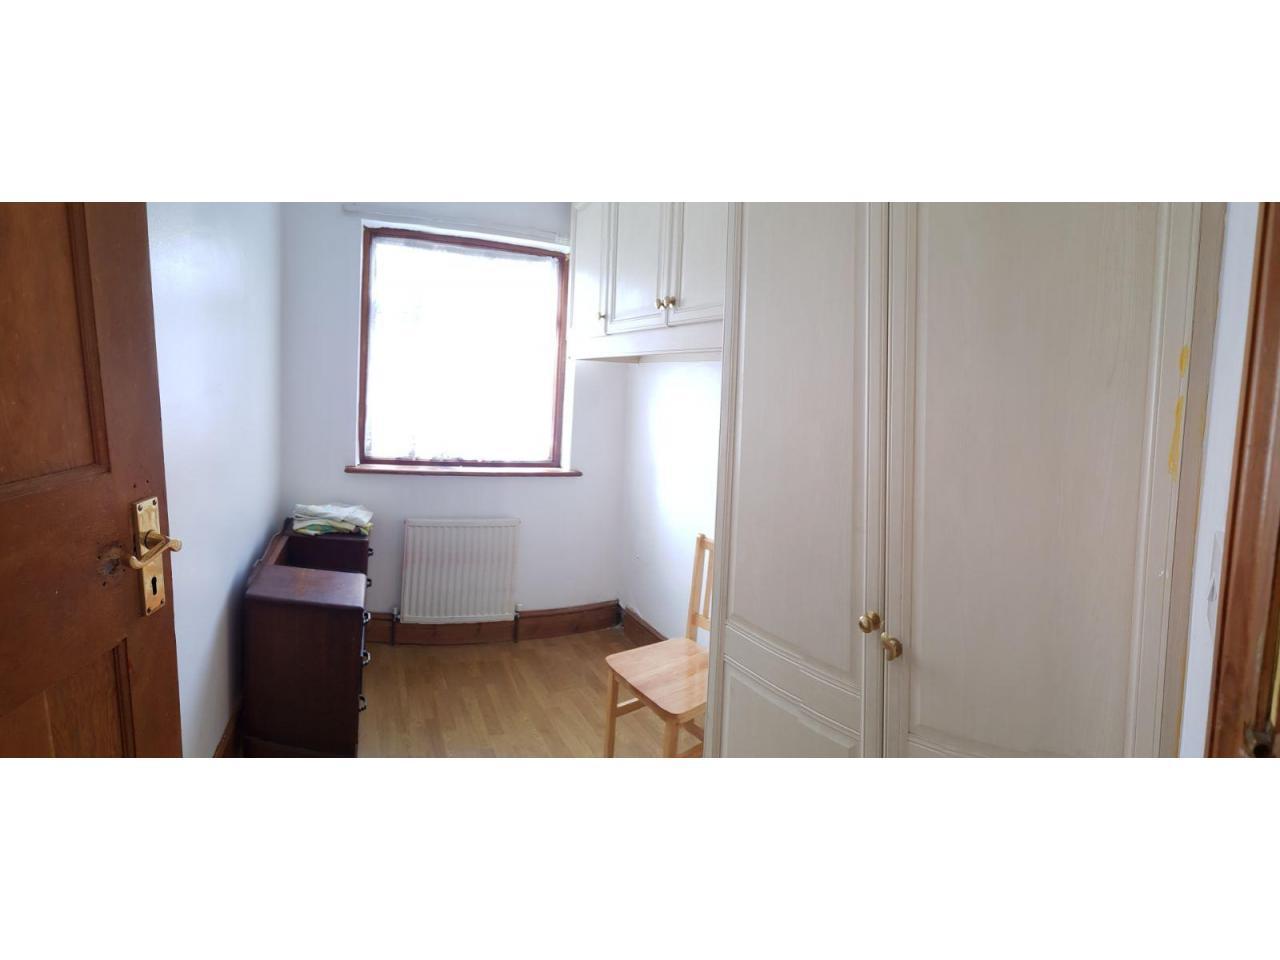 Сингл и Дабл комнаты в аренду на Neasden / Sudbury Hill / Harrow / Greenford. - 10